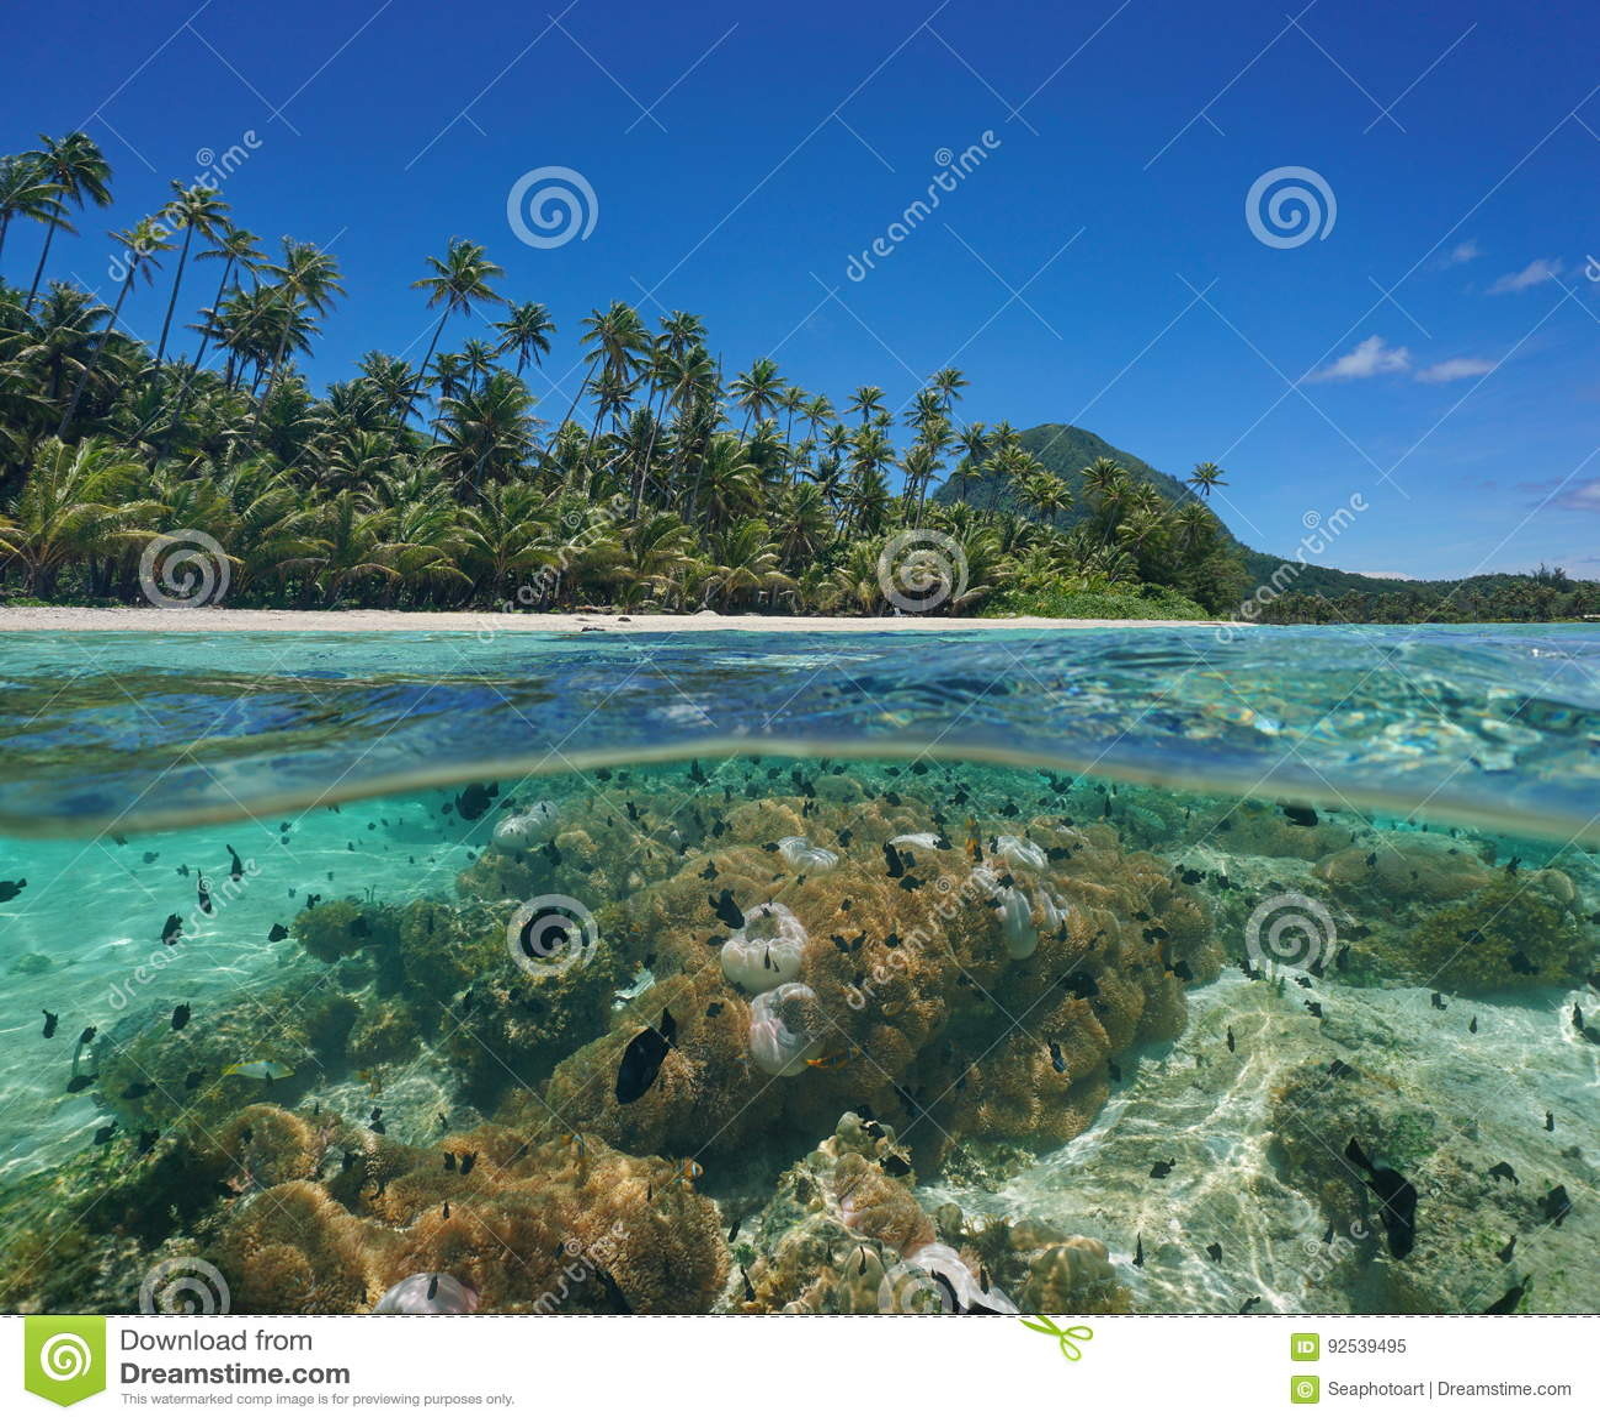 Over under lagoon island sea anemone fish Pacific